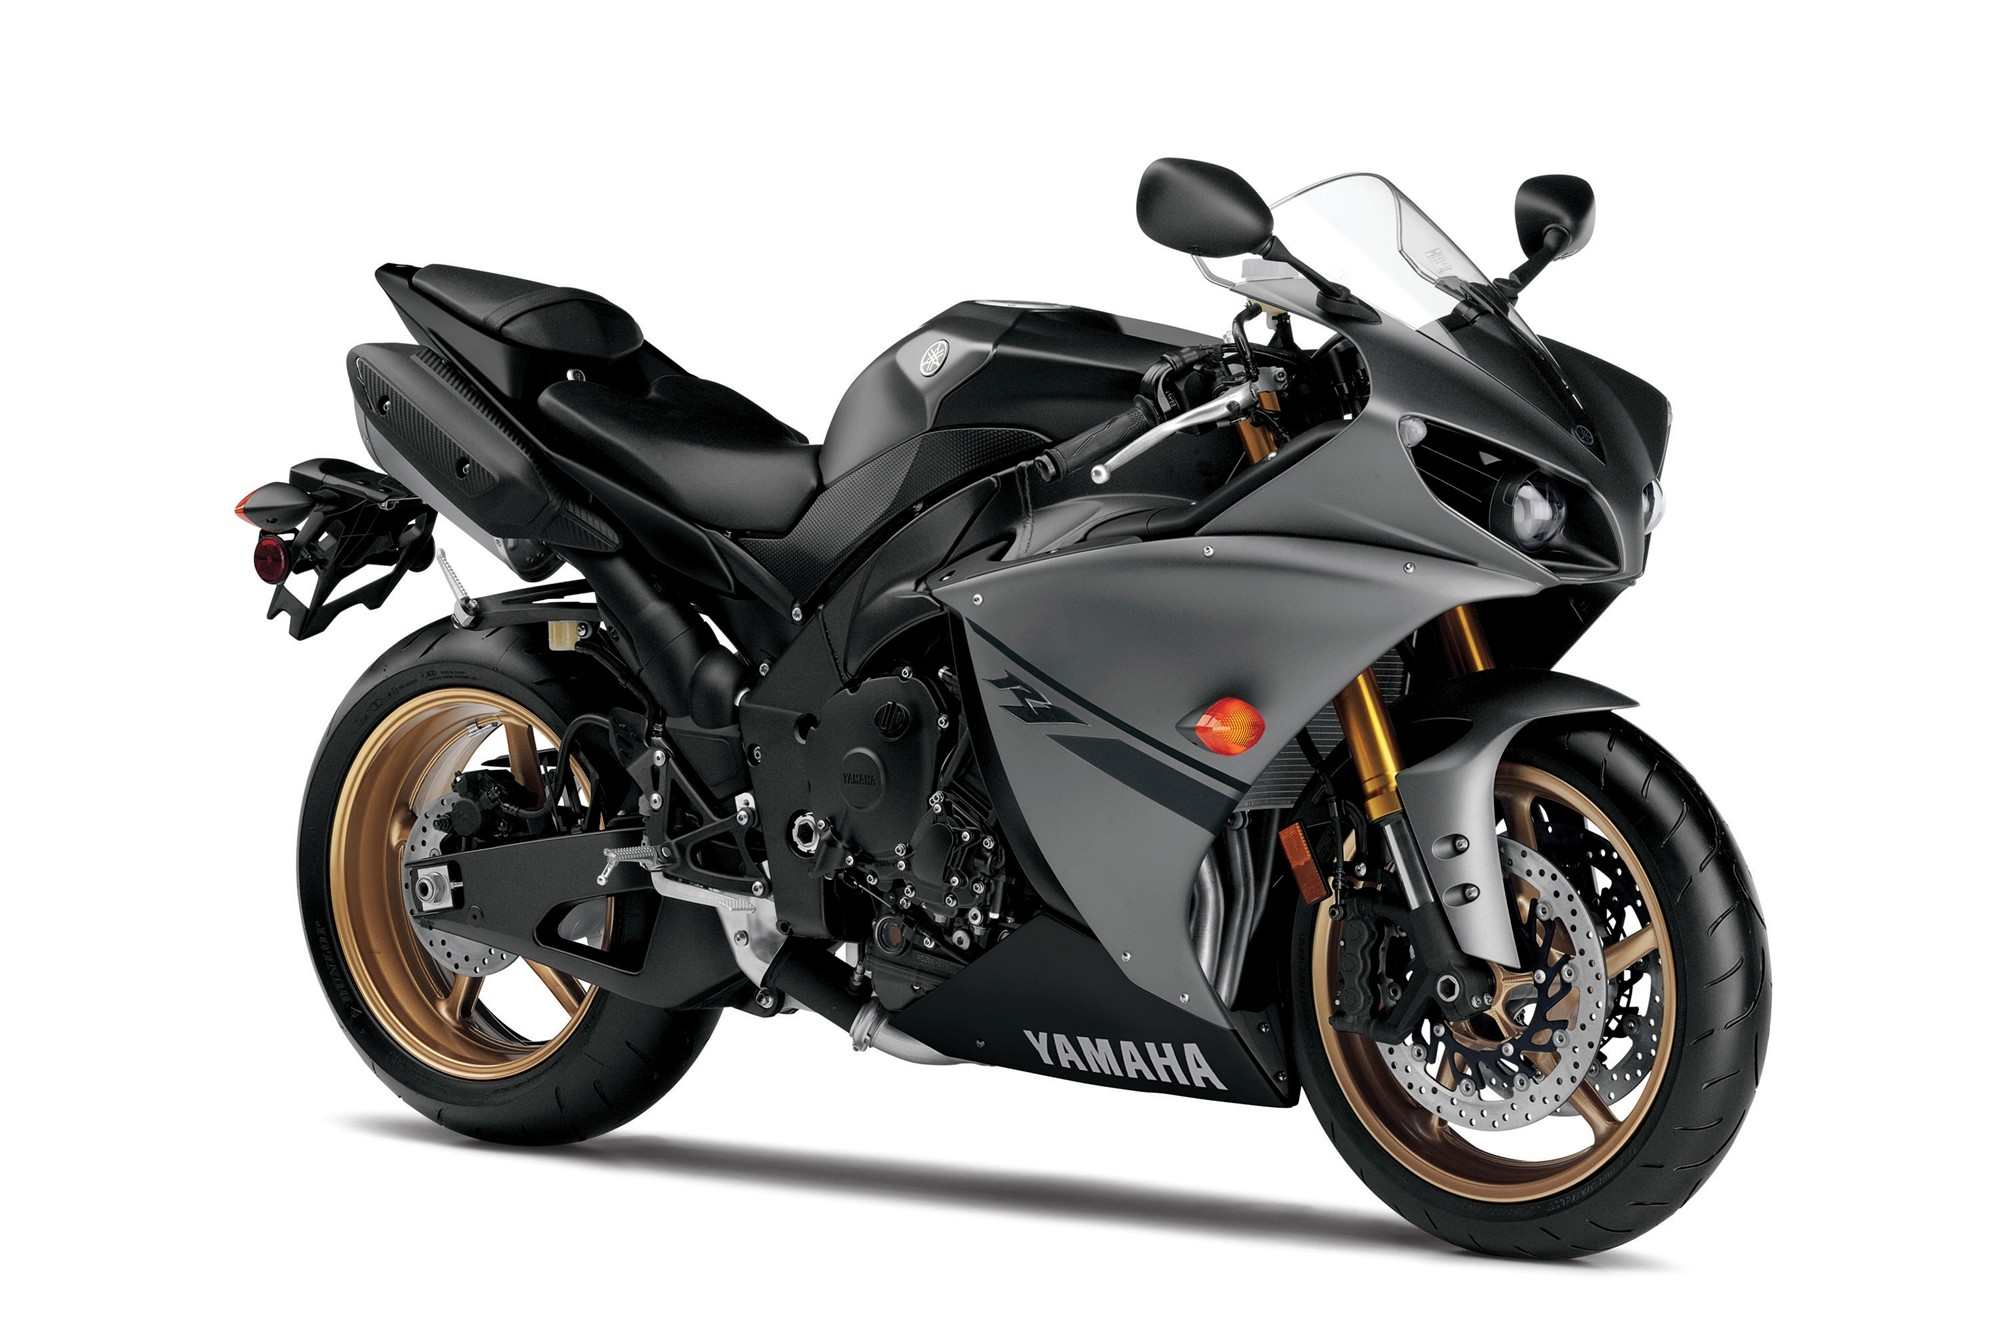 Res: 2000x1333, Yamaha yzf r1